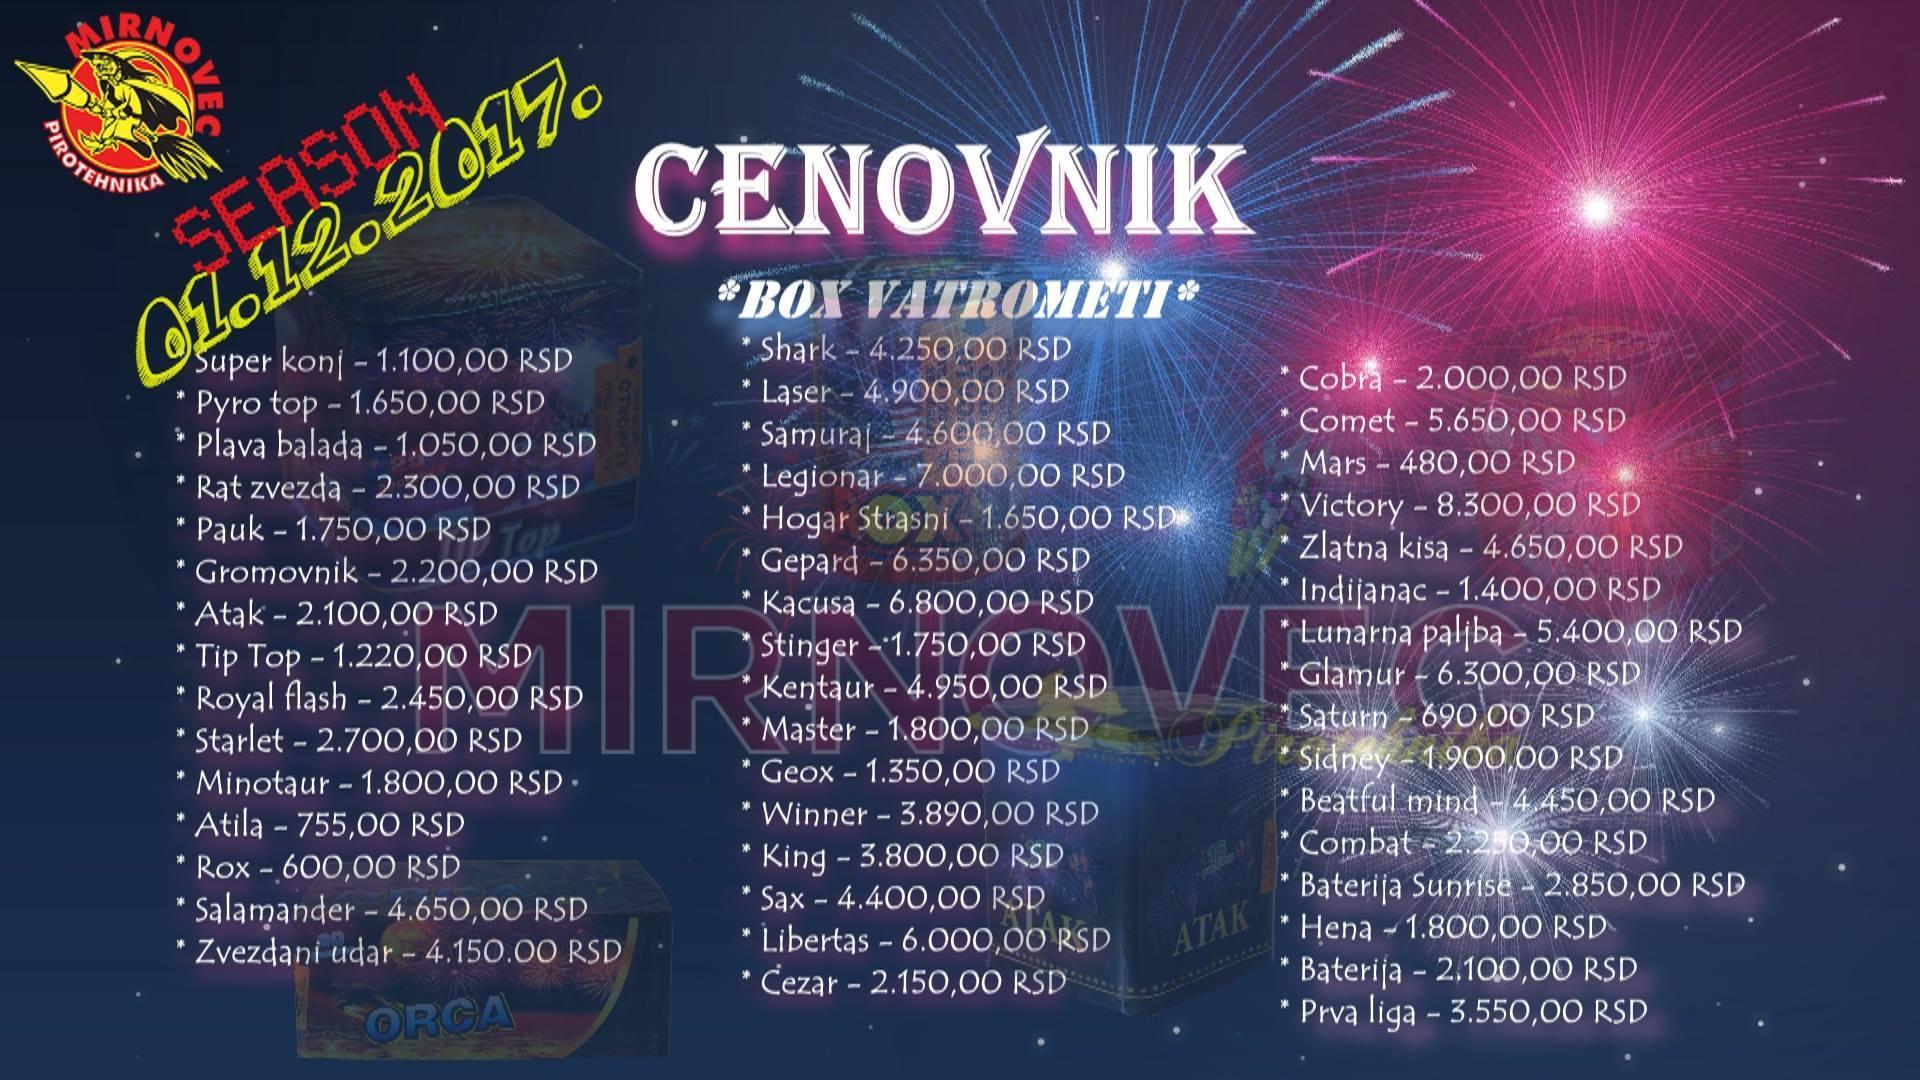 Cenovnik - Box Vatrometi